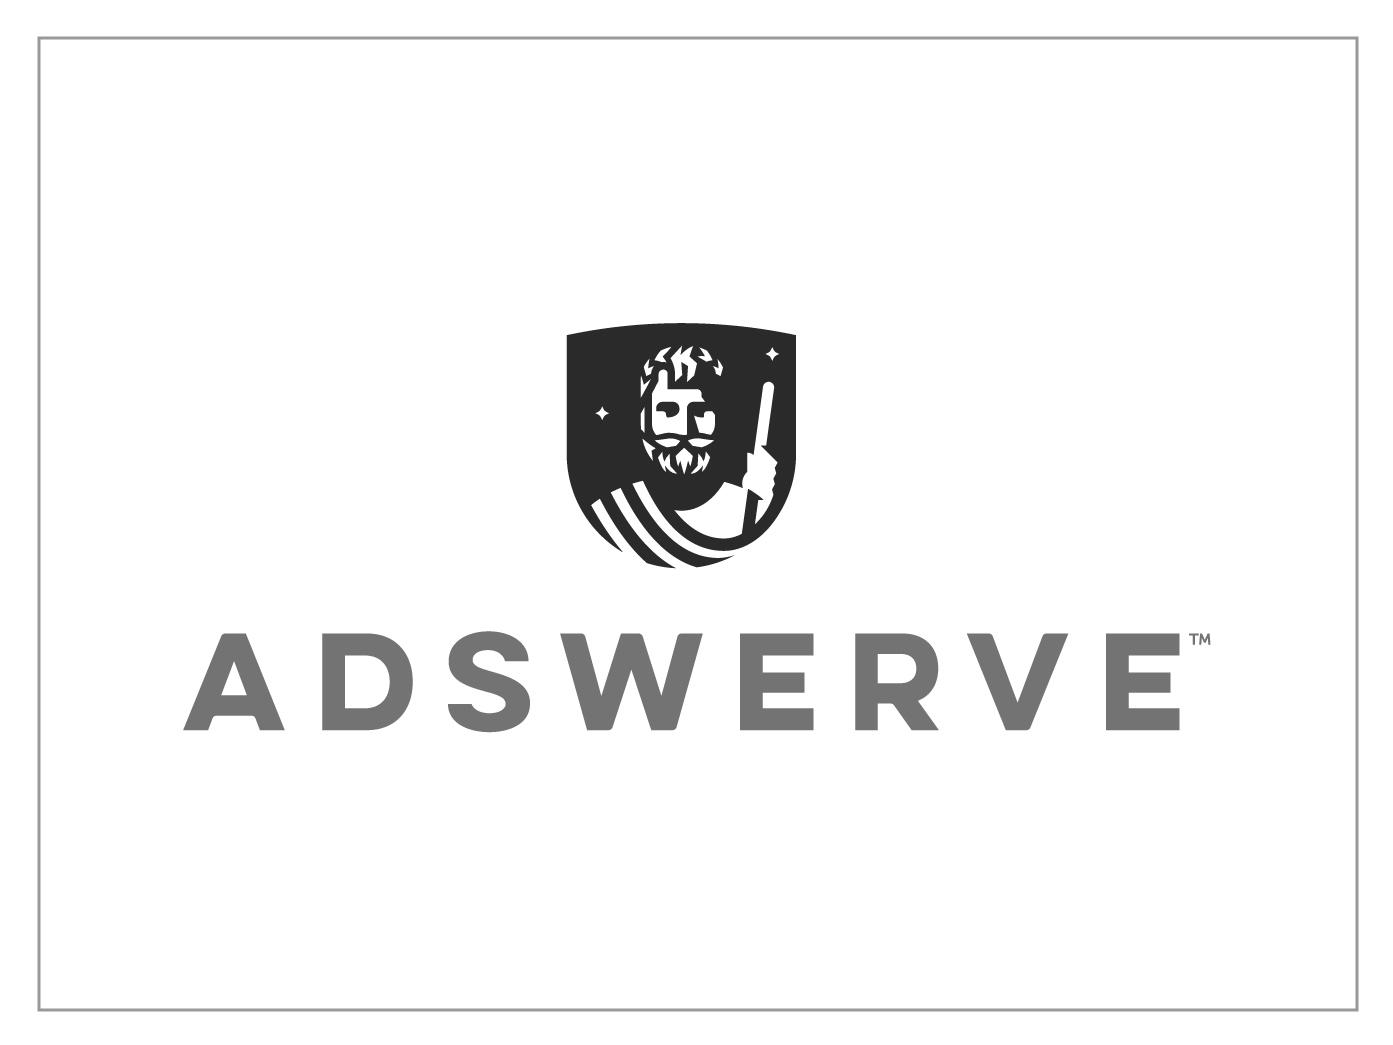 adswerve_logo.jpg